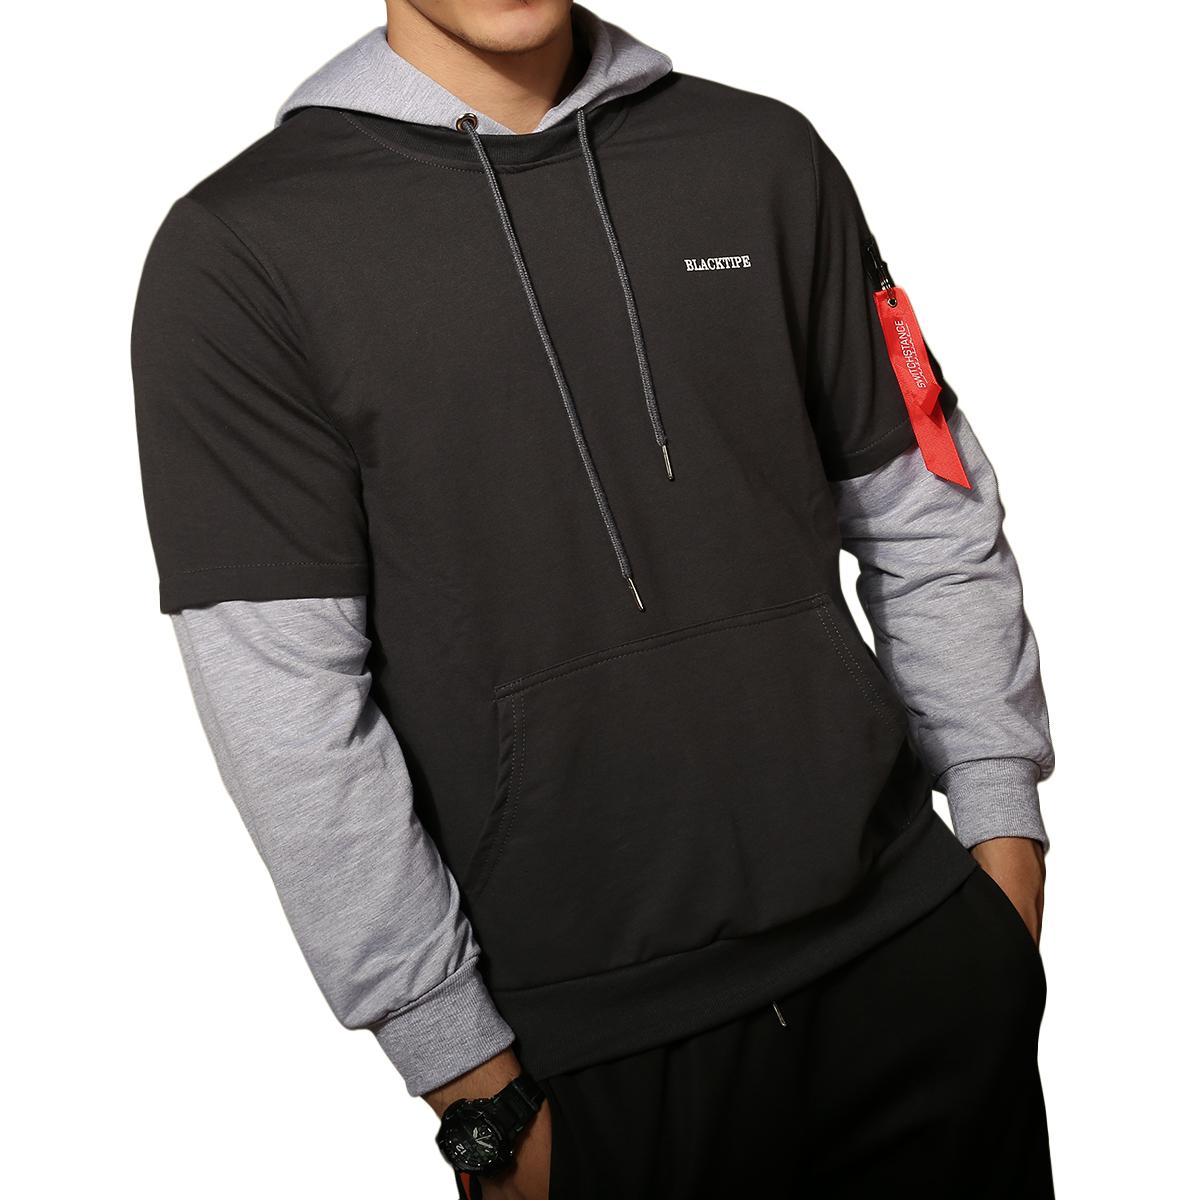 Oversized Mens Sweater Skull Printed Slim Fit Black Hoodie Fast Shipping  3619